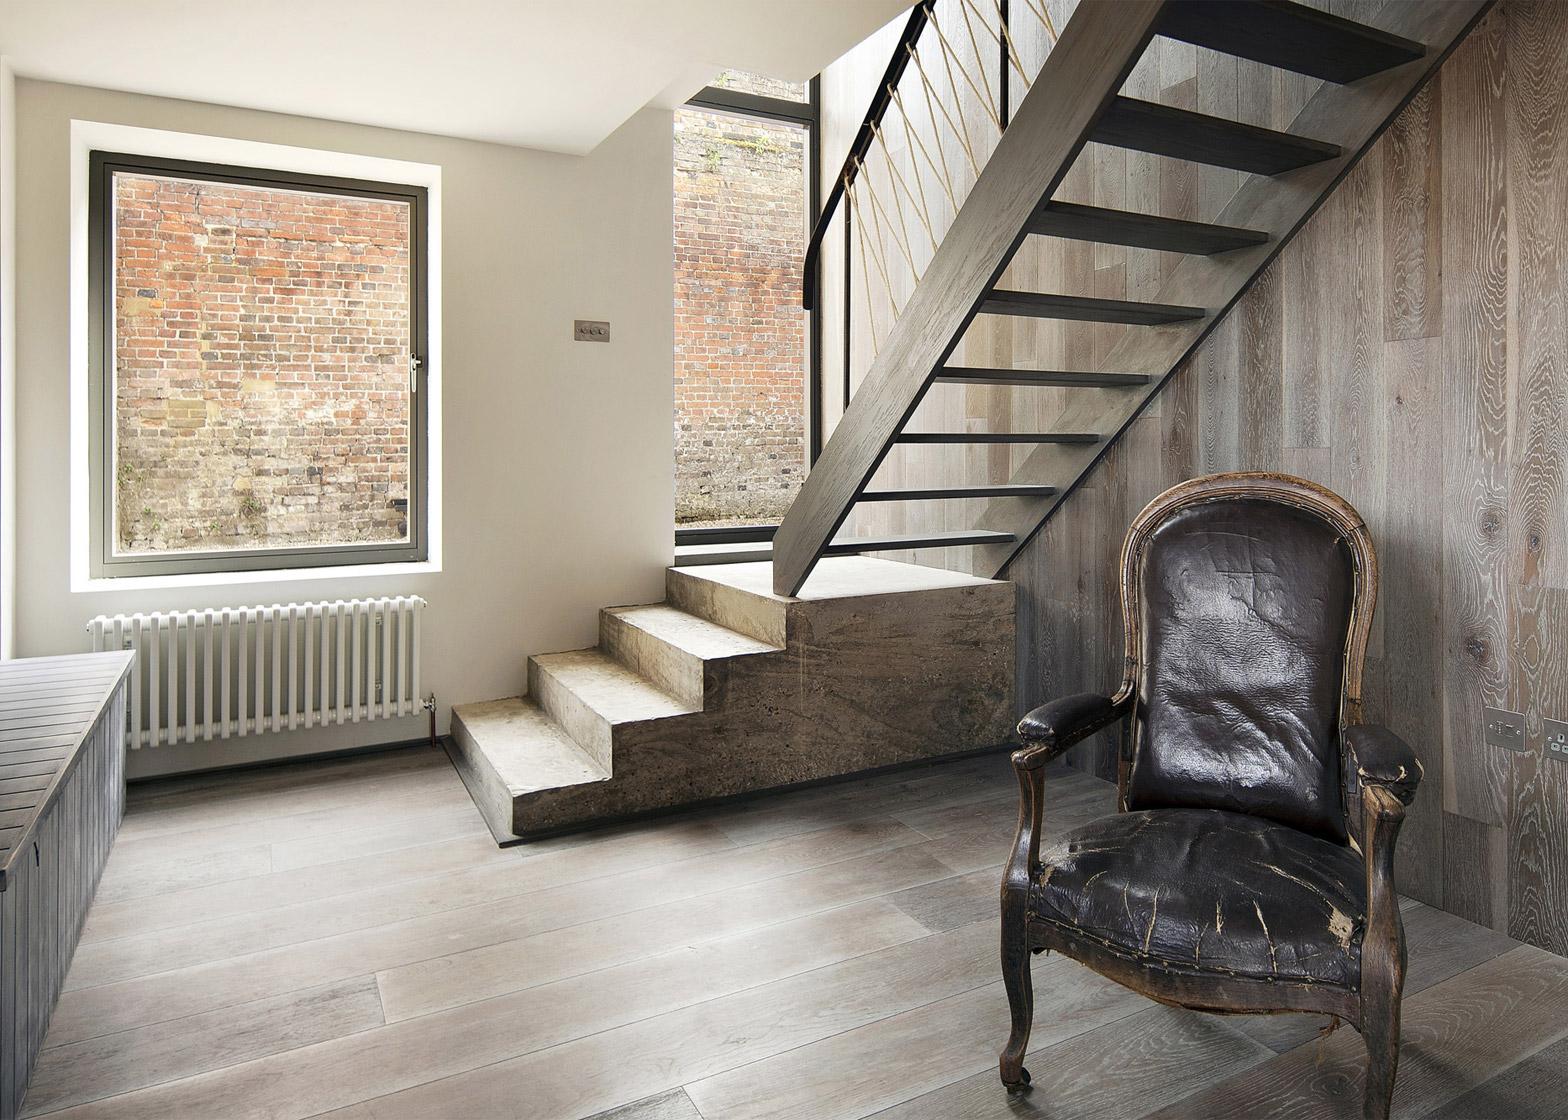 architecture_ambulance_house__design_studia_interiors_osnovadesign_osnova_poltava_06